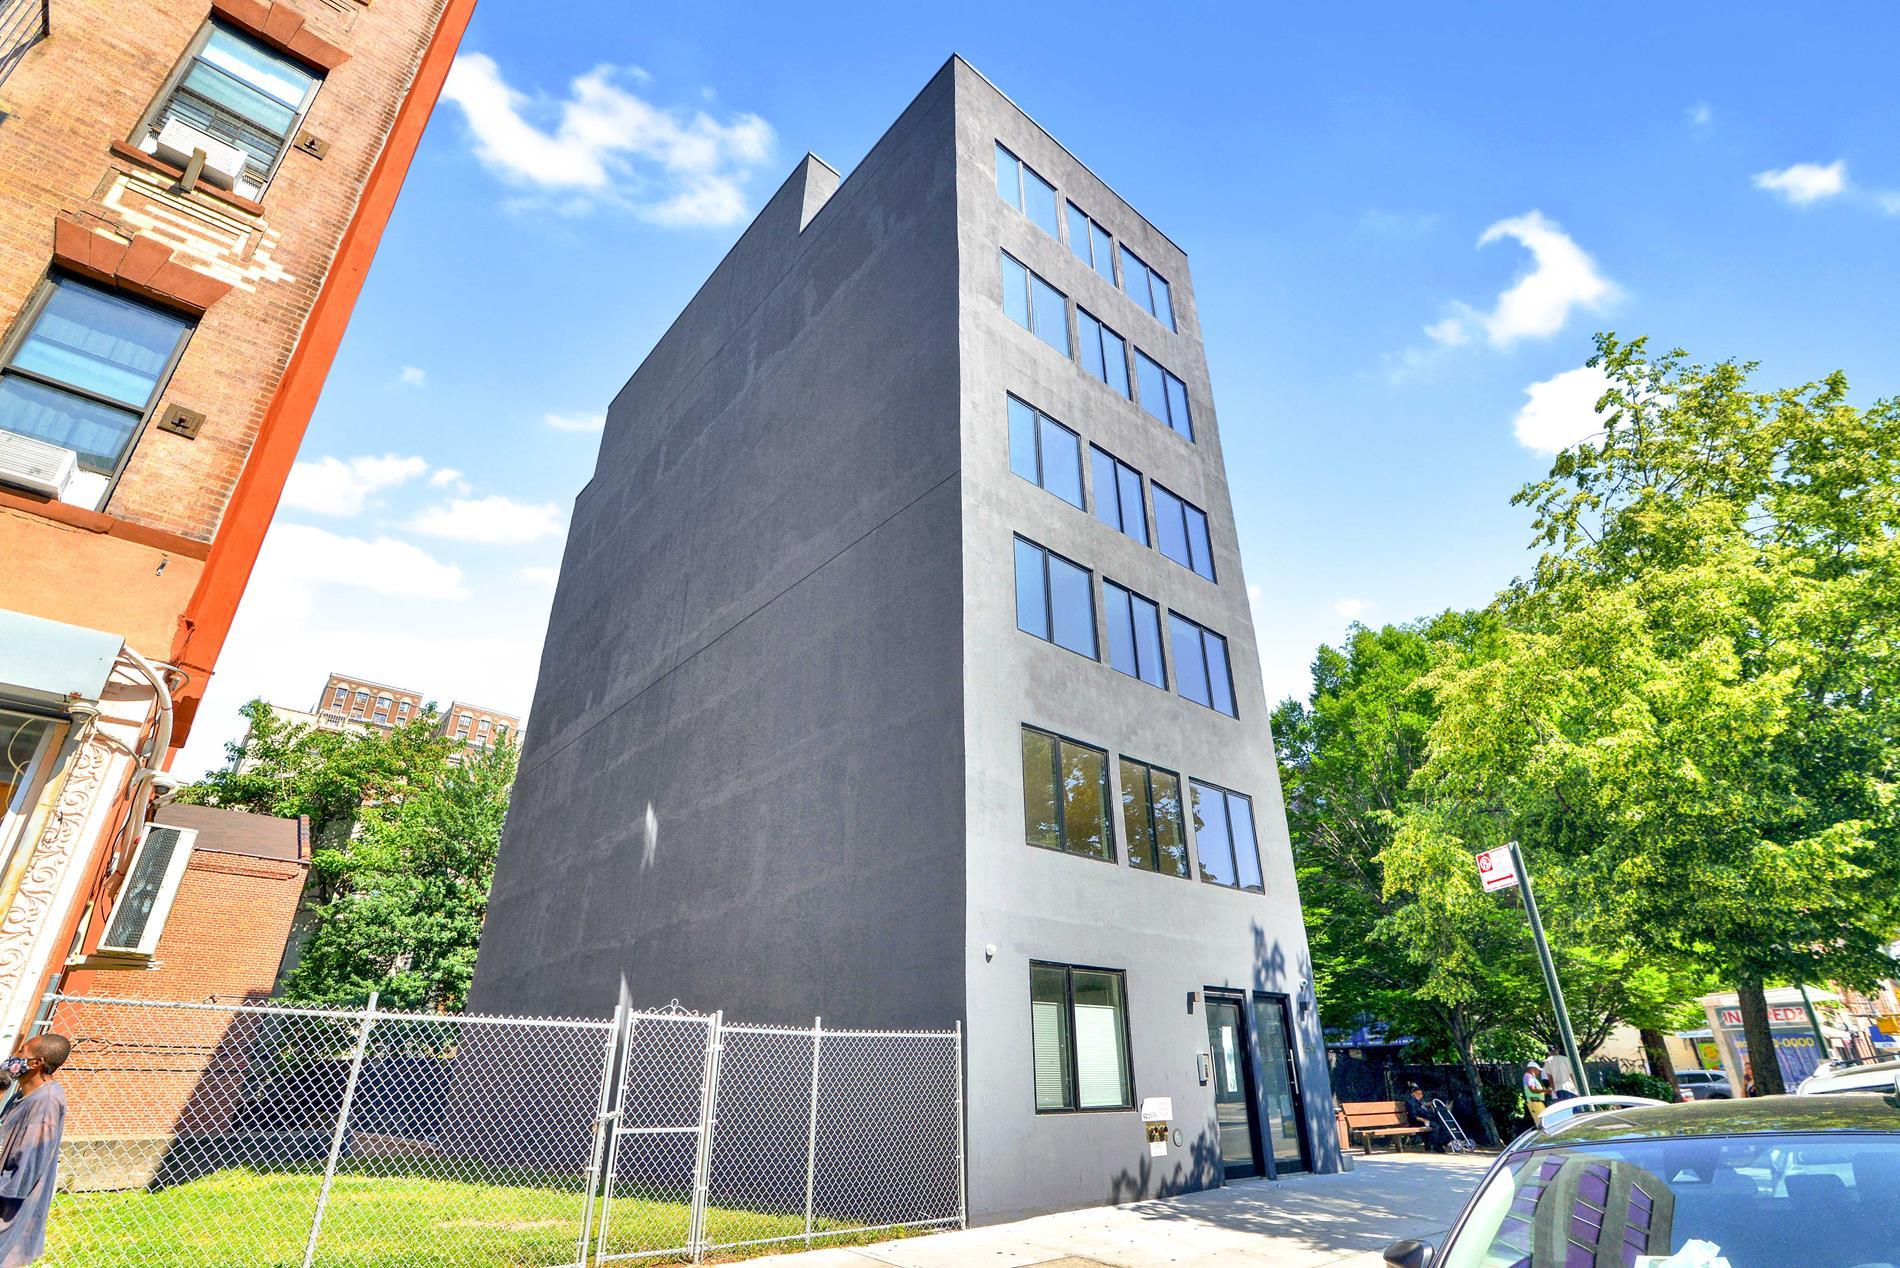 2903 Frederick Douglass Blvd. West Harlem New York NY 10039